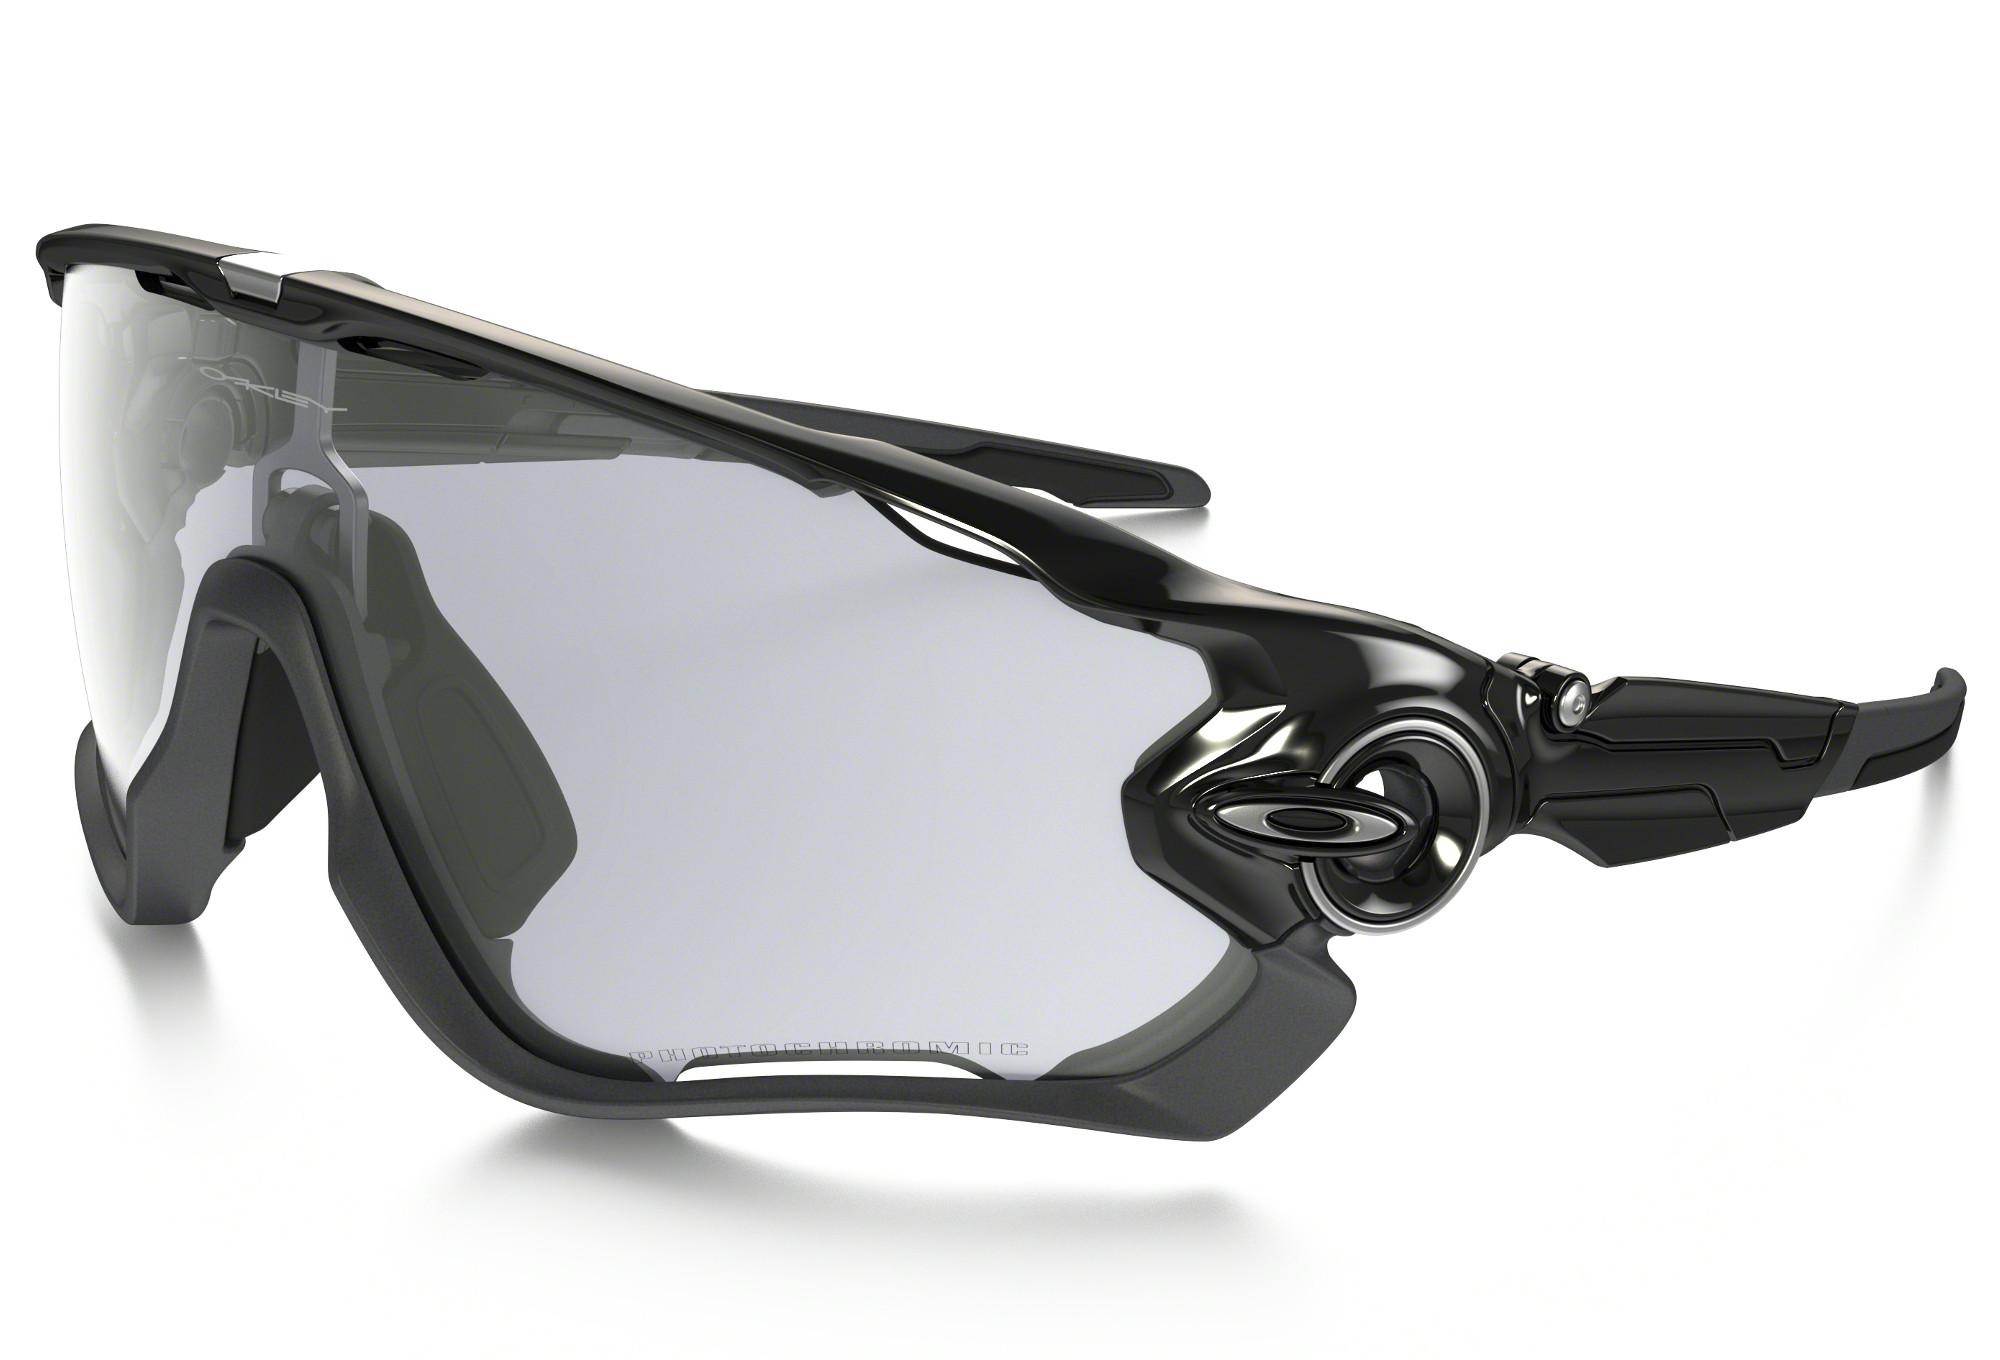 Oakley Jawbreaker Clear Iridium Photochromic Lunettes de soleil Noir ejxOR